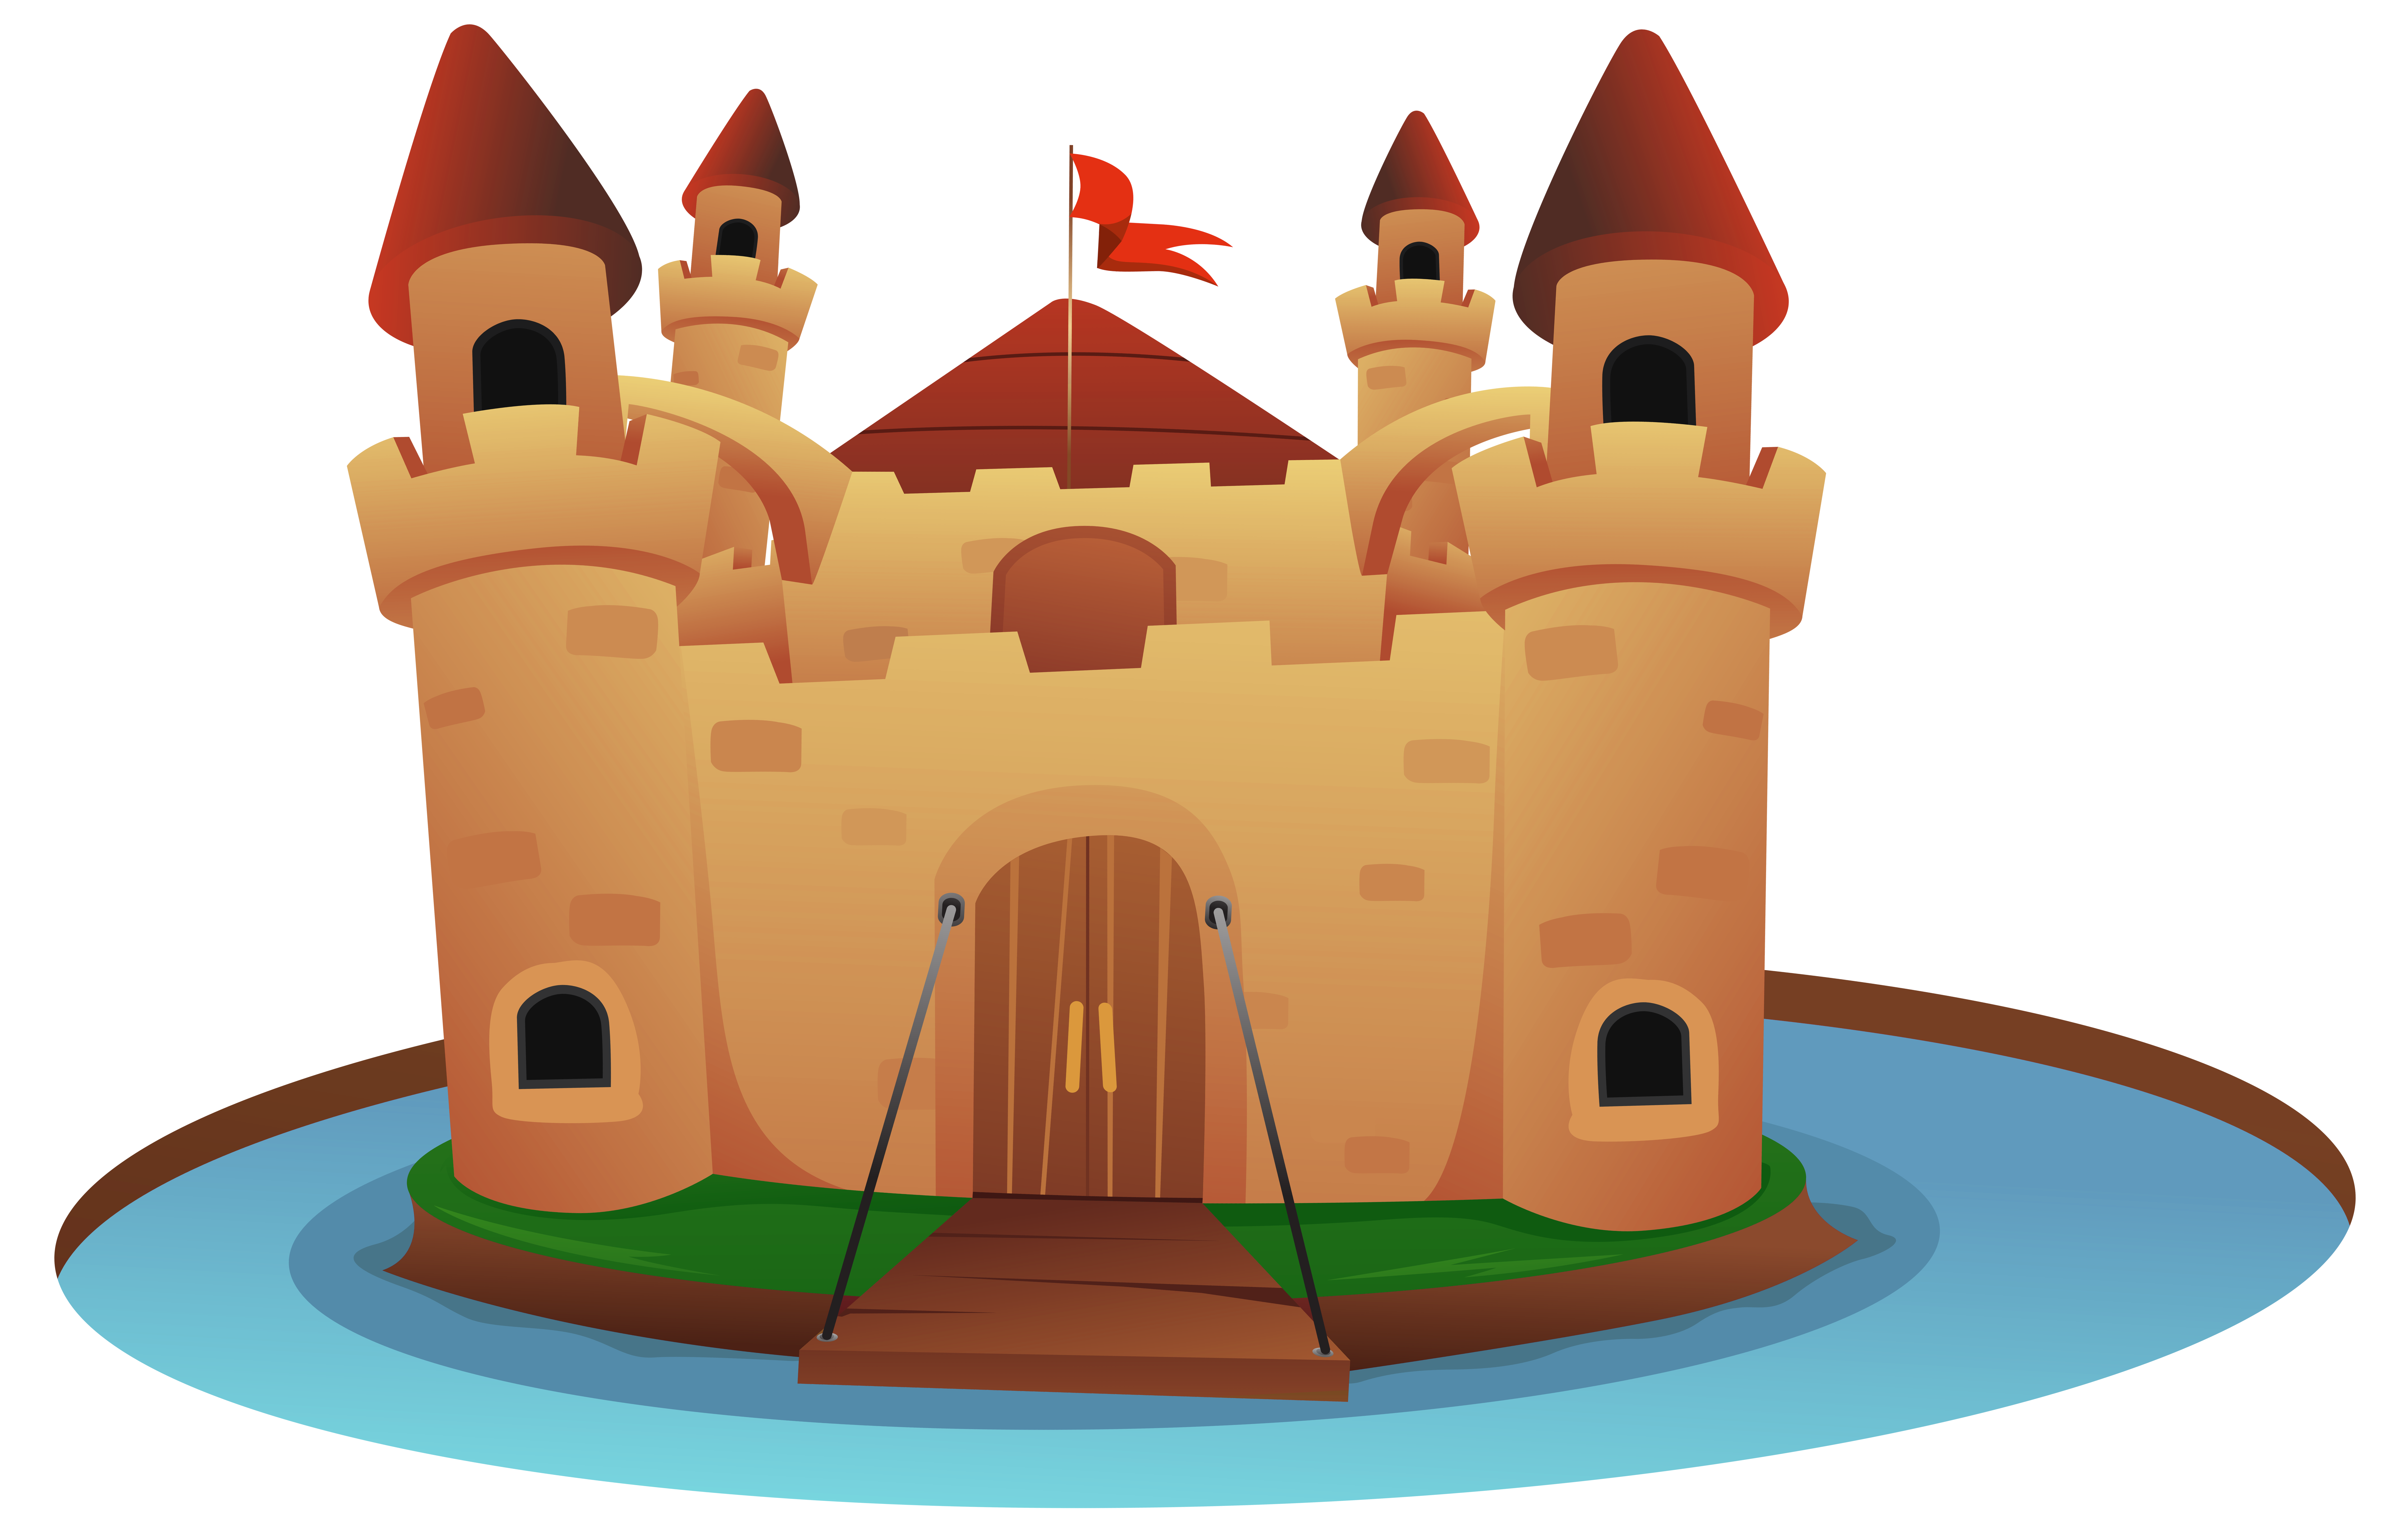 Castle cartoon clipart clip art royalty free download Castle Cartoon PNG Clip Art Image | Gallery Yopriceville - High ... clip art royalty free download